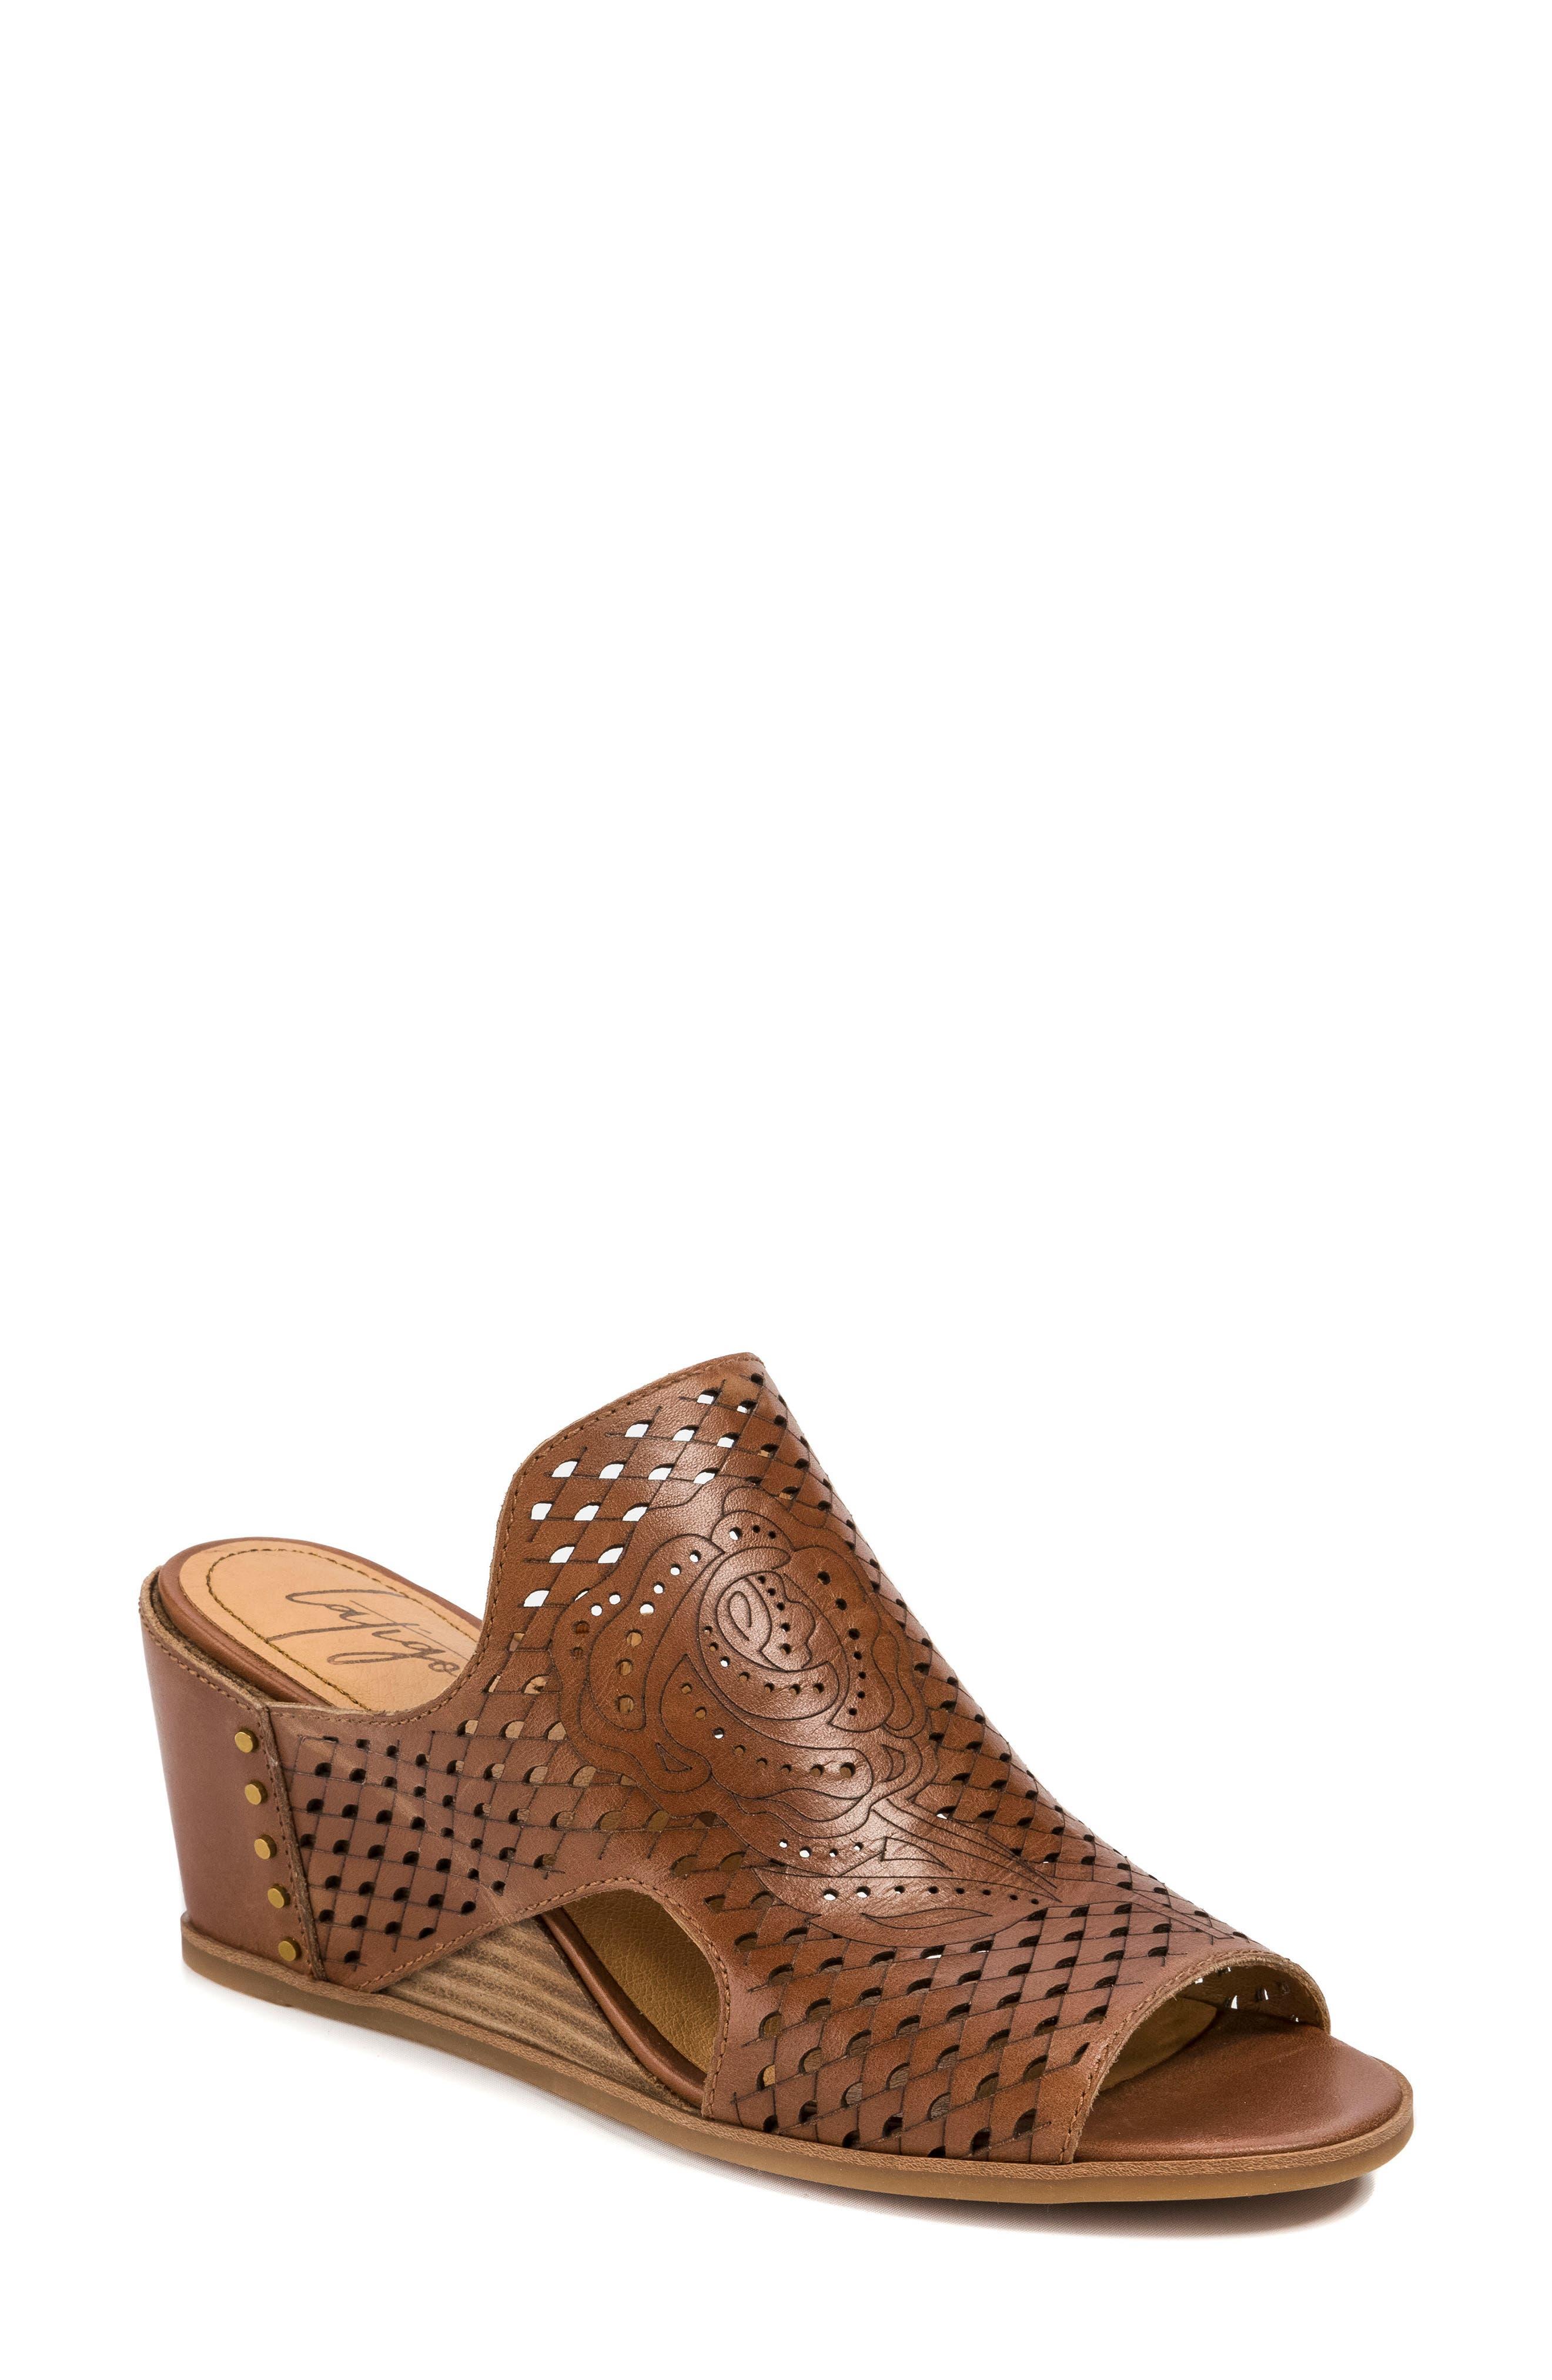 Janis Laser Cut Wedge Sandal,                         Main,                         color, Brush Brown Leather